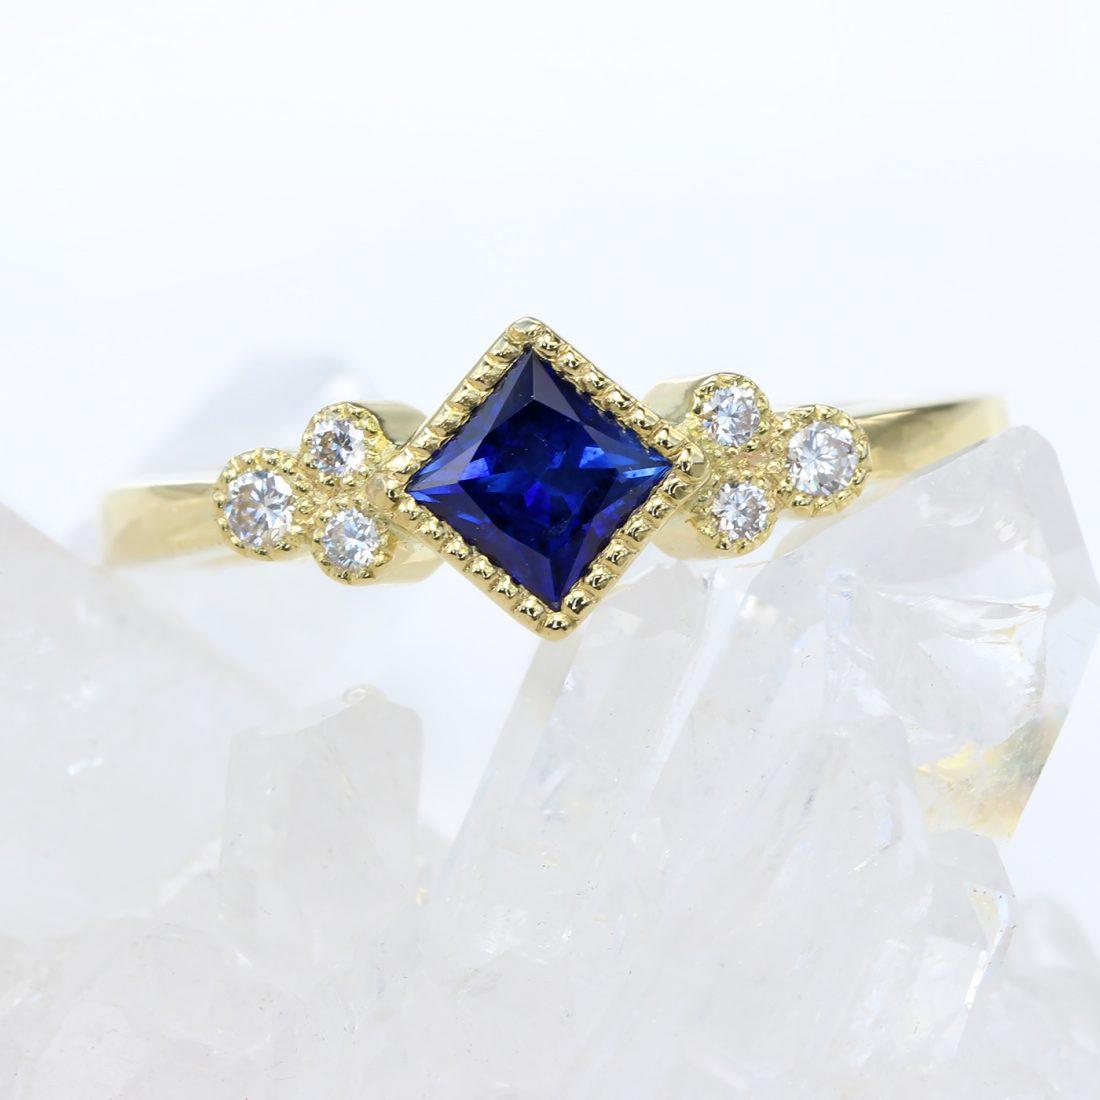 Princess cut sapphire and diamond trilogy ring 18ct gold